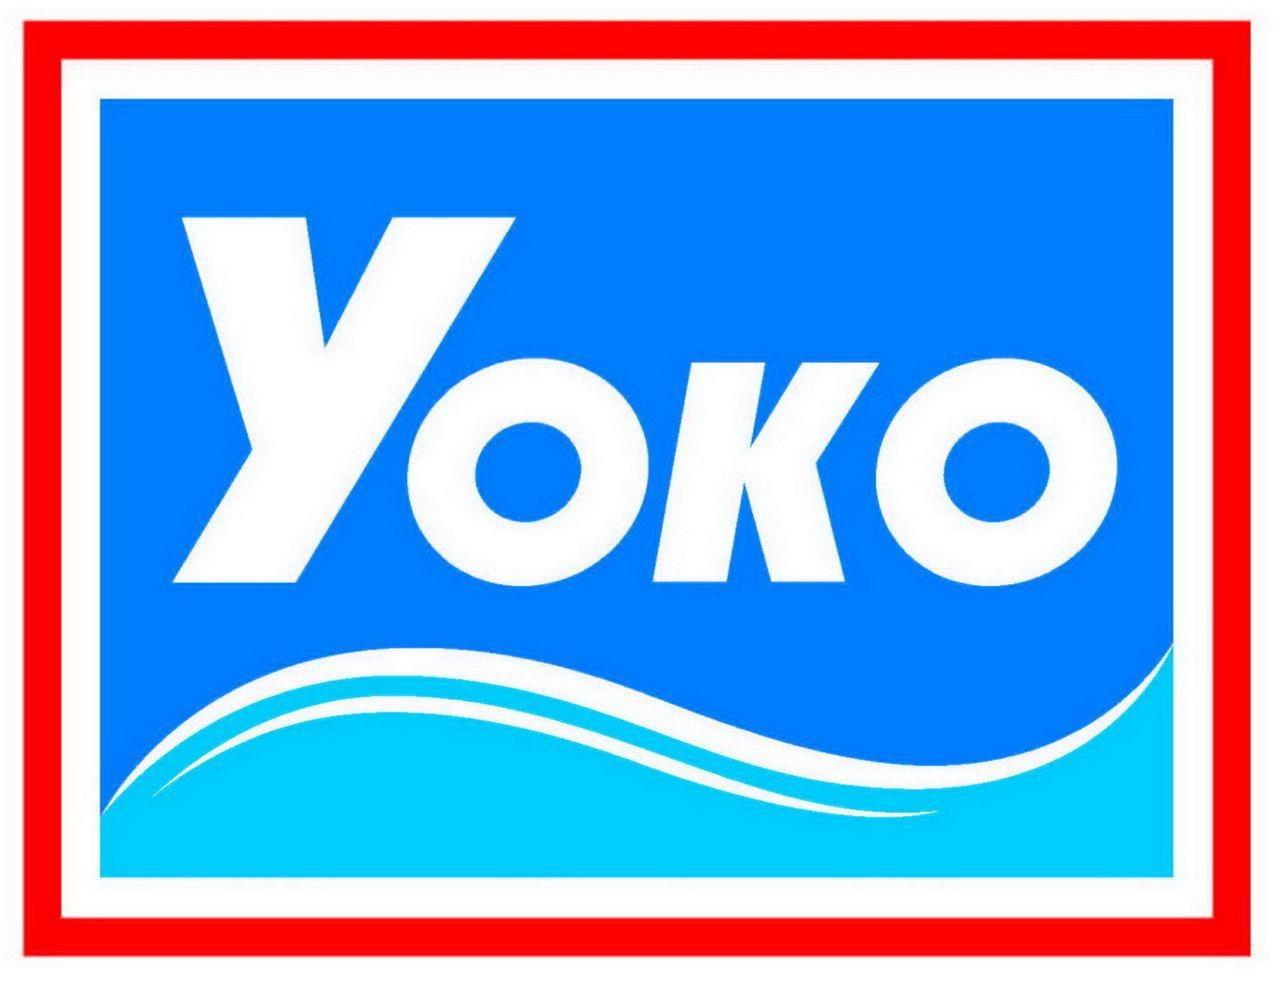 يوكو - YOKO